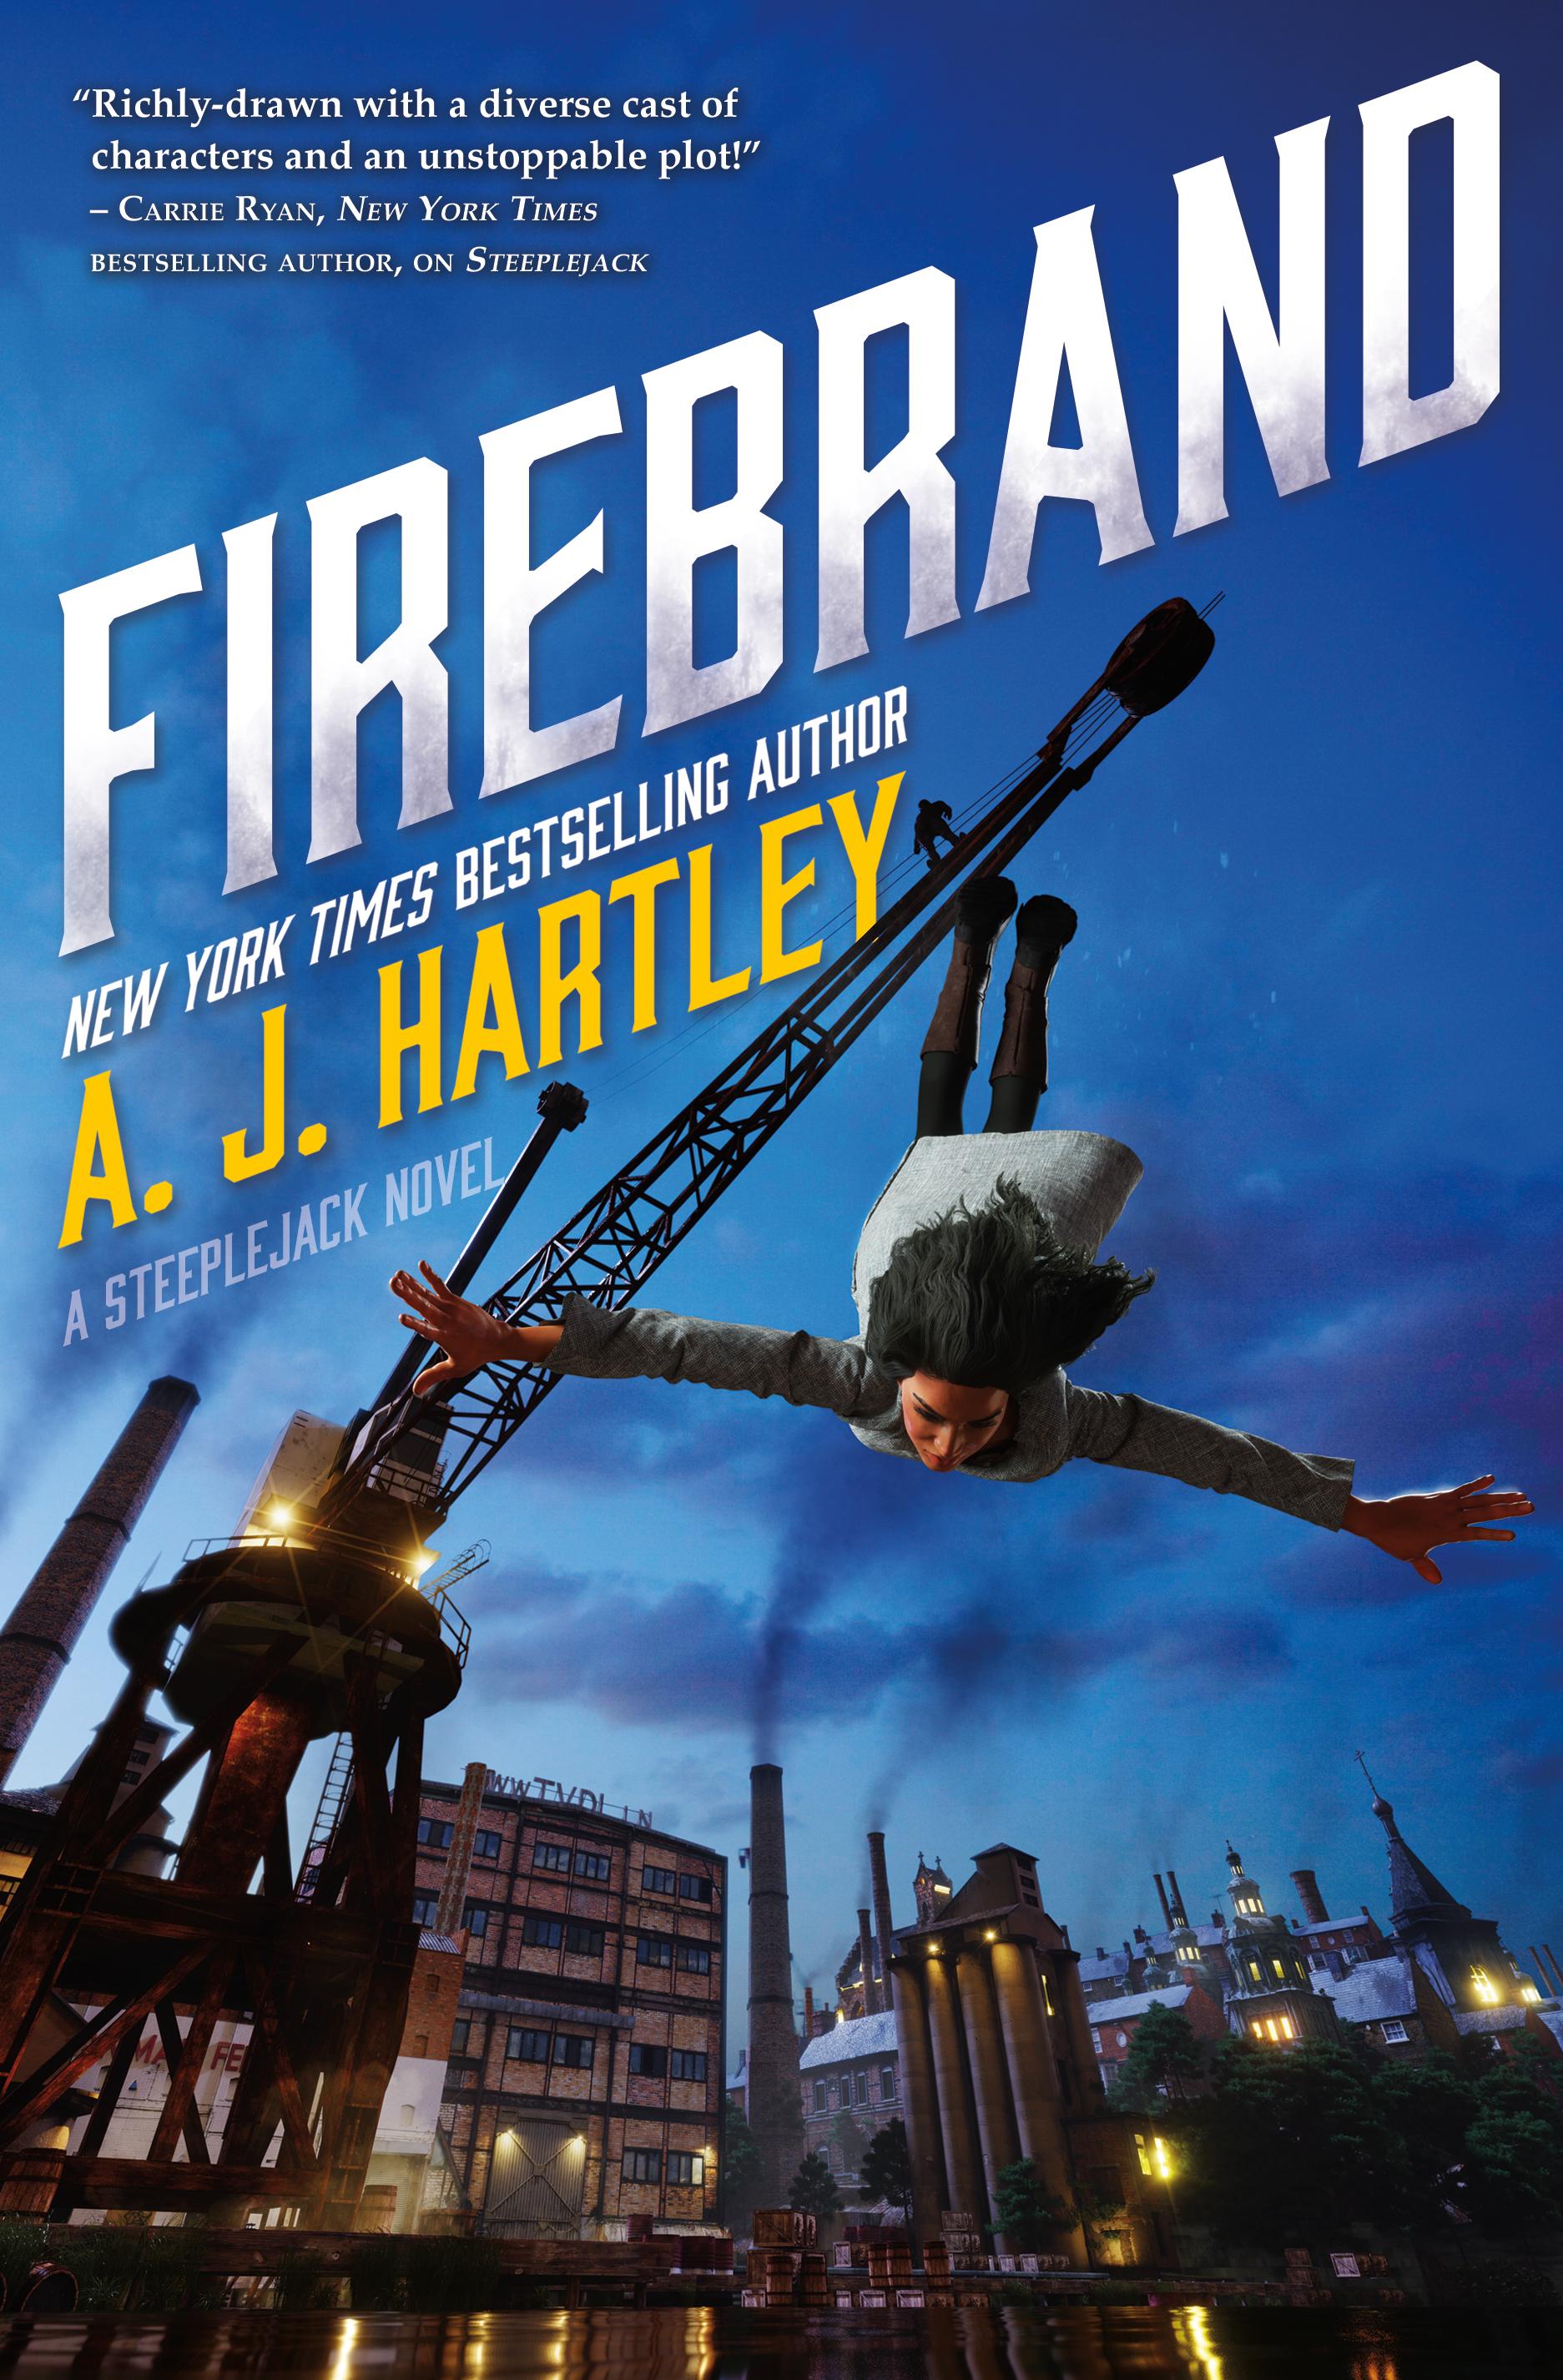 Firebrand